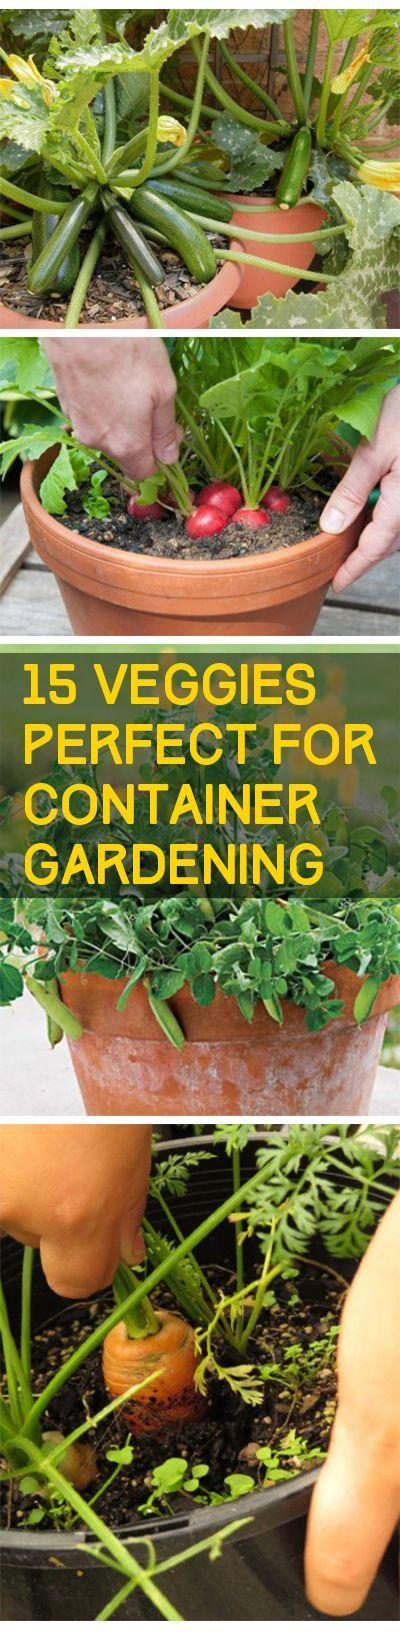 Container Gardening Veggies: list, tips, ideas-Blessmyweeds.com